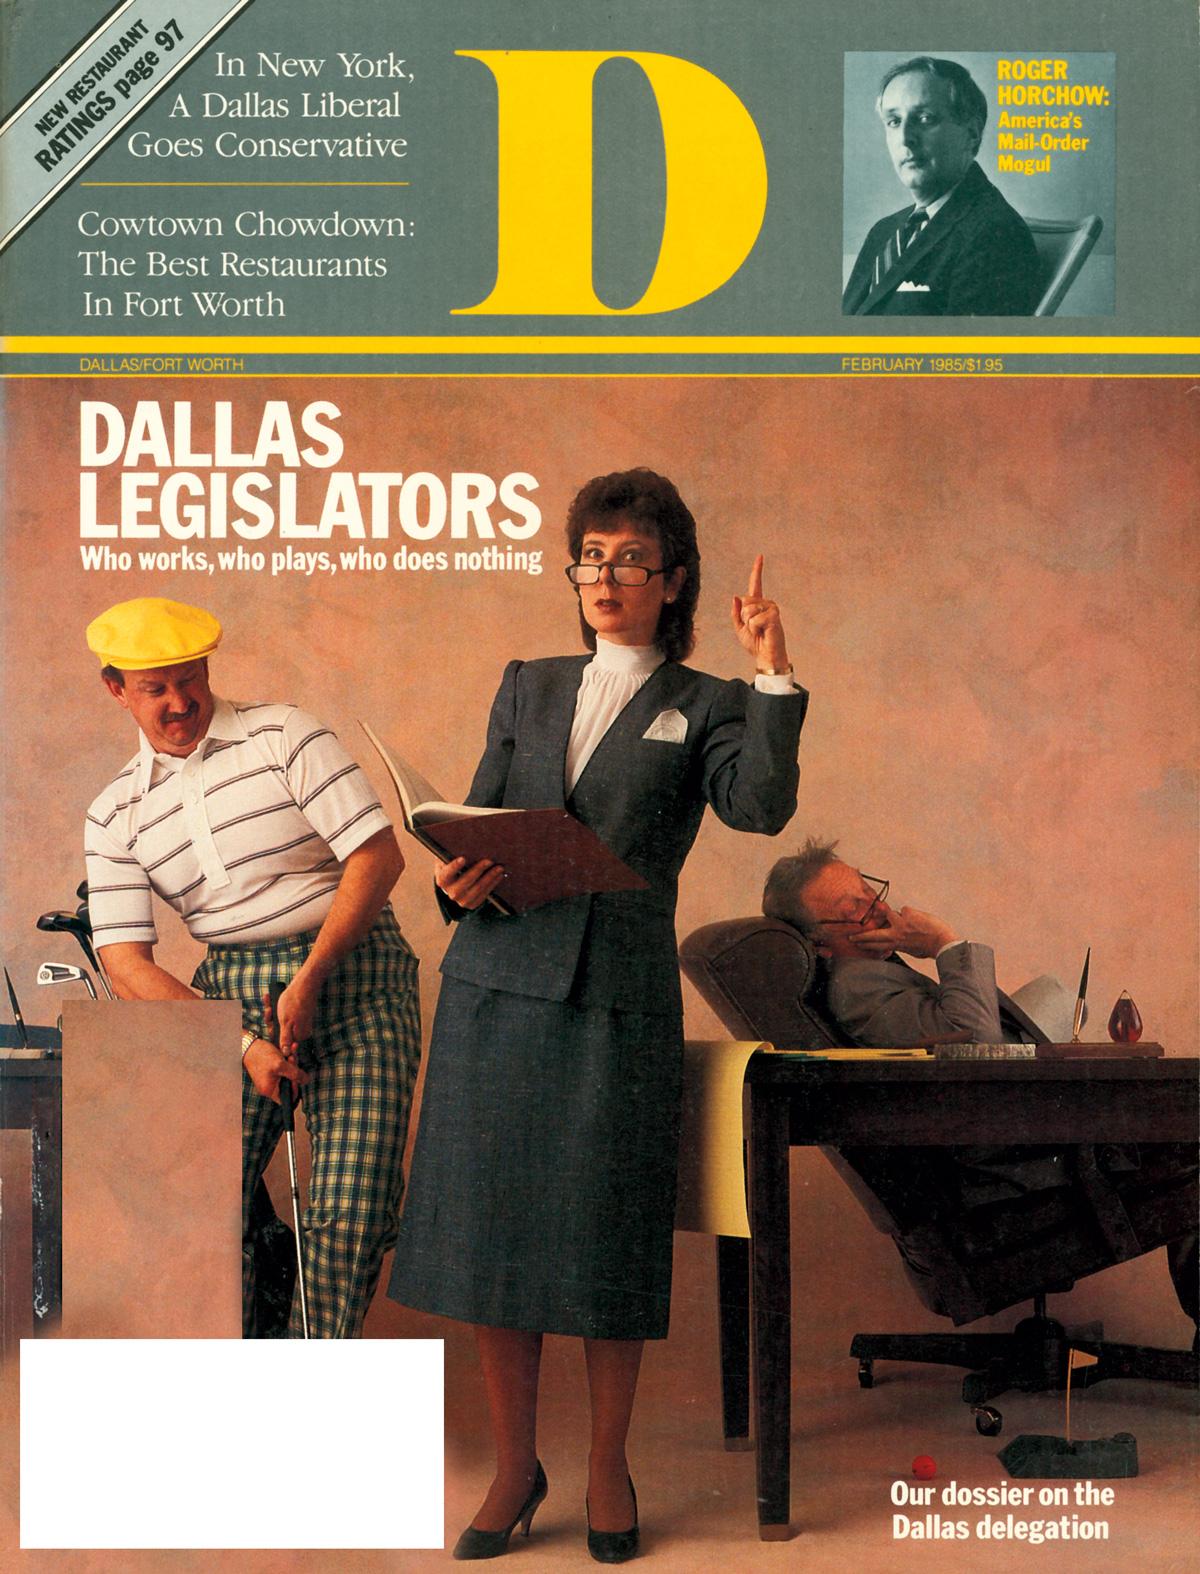 February 1985 cover